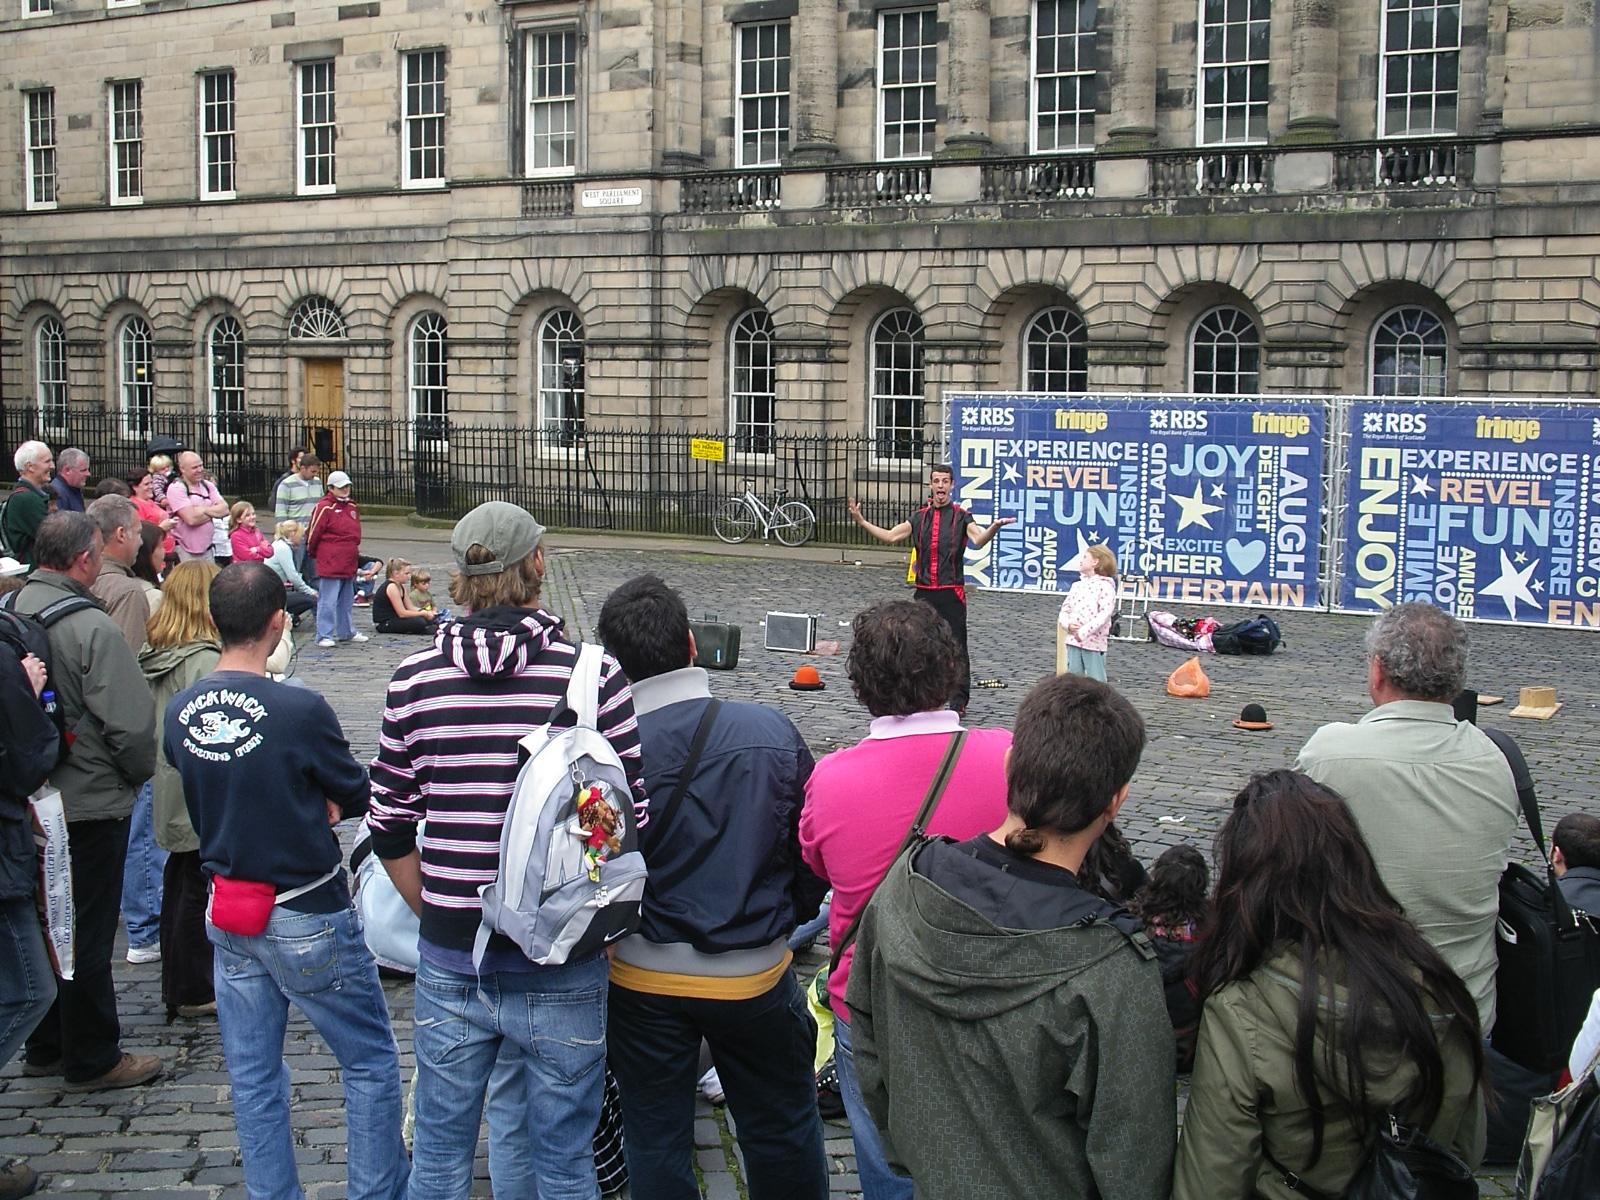 Street performance at a city square, Edinburgh, in Fringe Festival